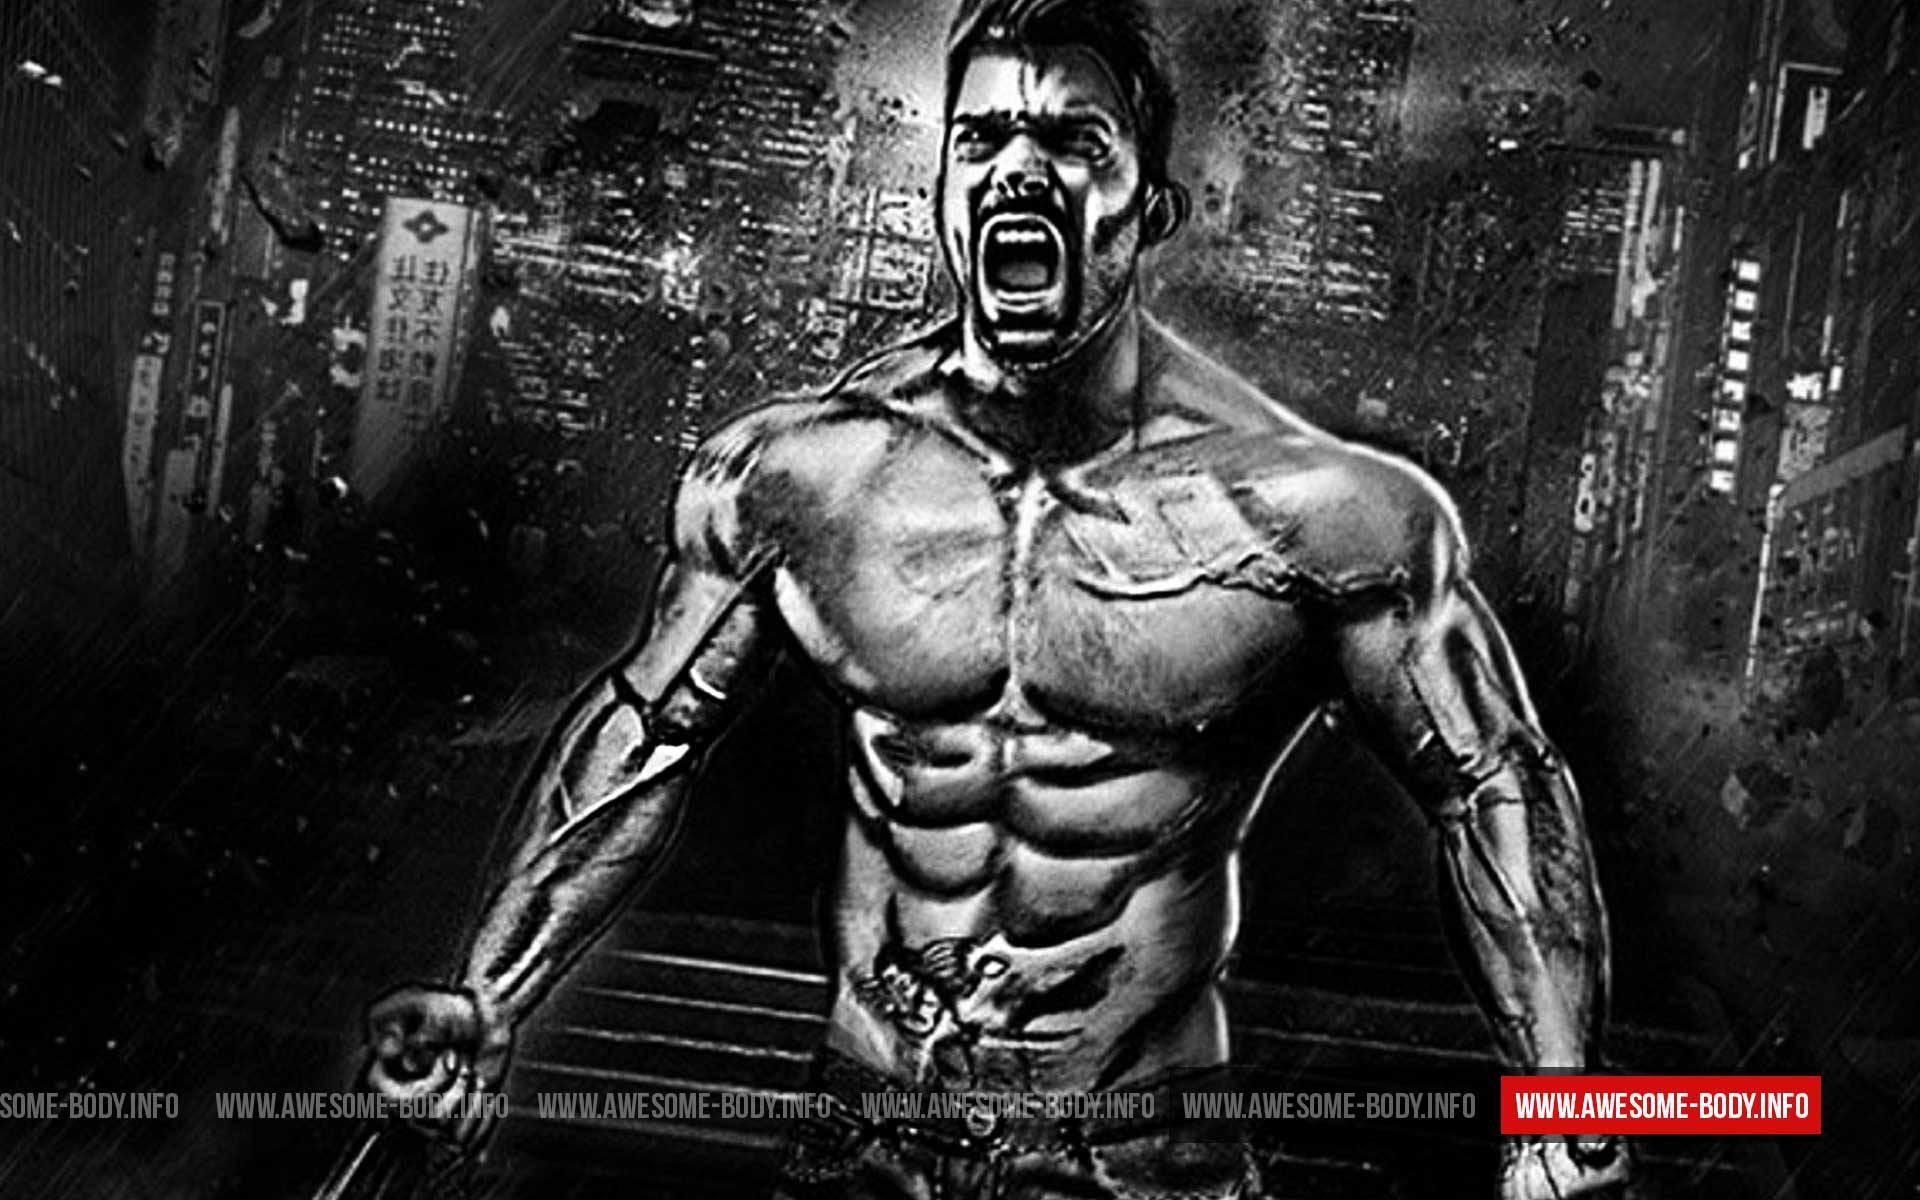 Arnold Schwarzenegger Quotes Wallpaper Bodybuilding Wallpaper Hd 2017 183 ①